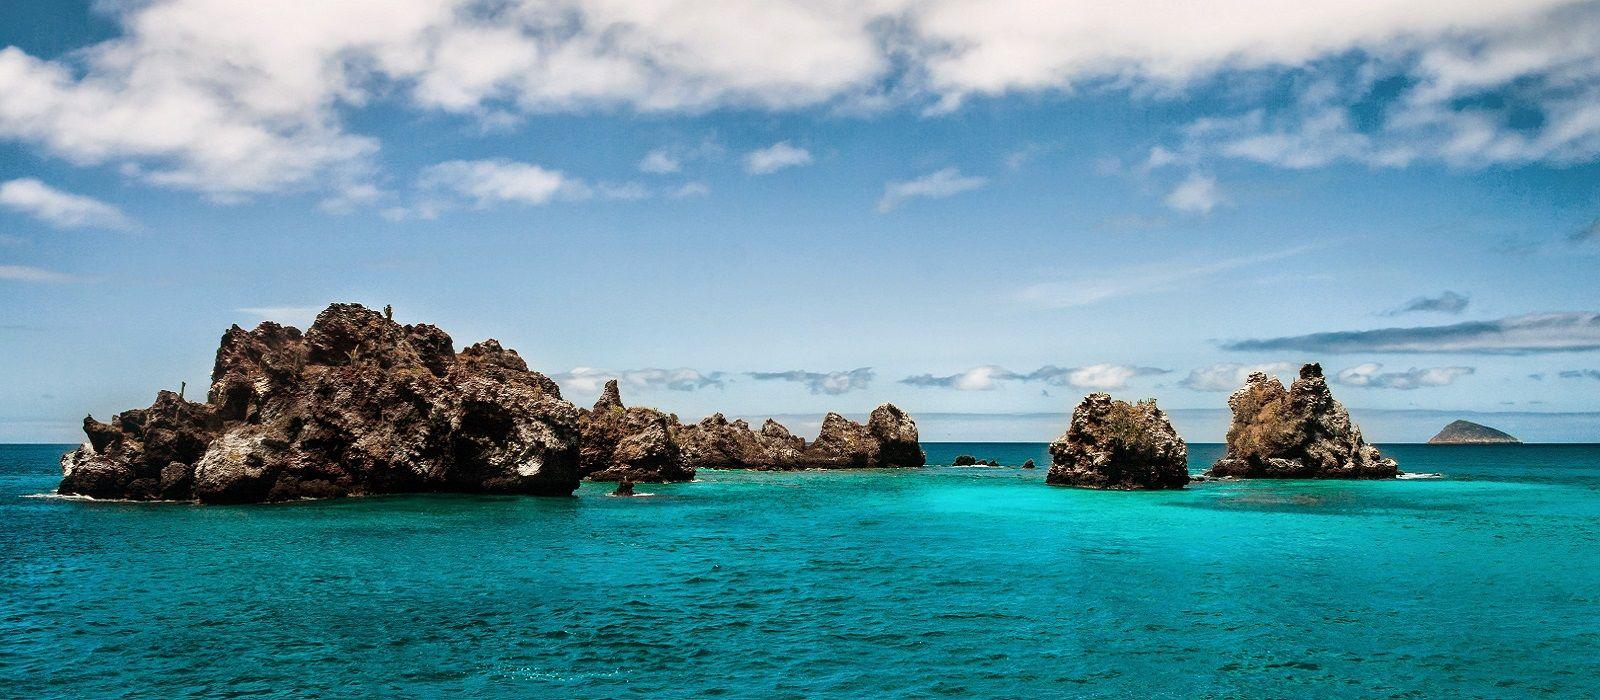 Felsformationen auf den Galapagosinseln